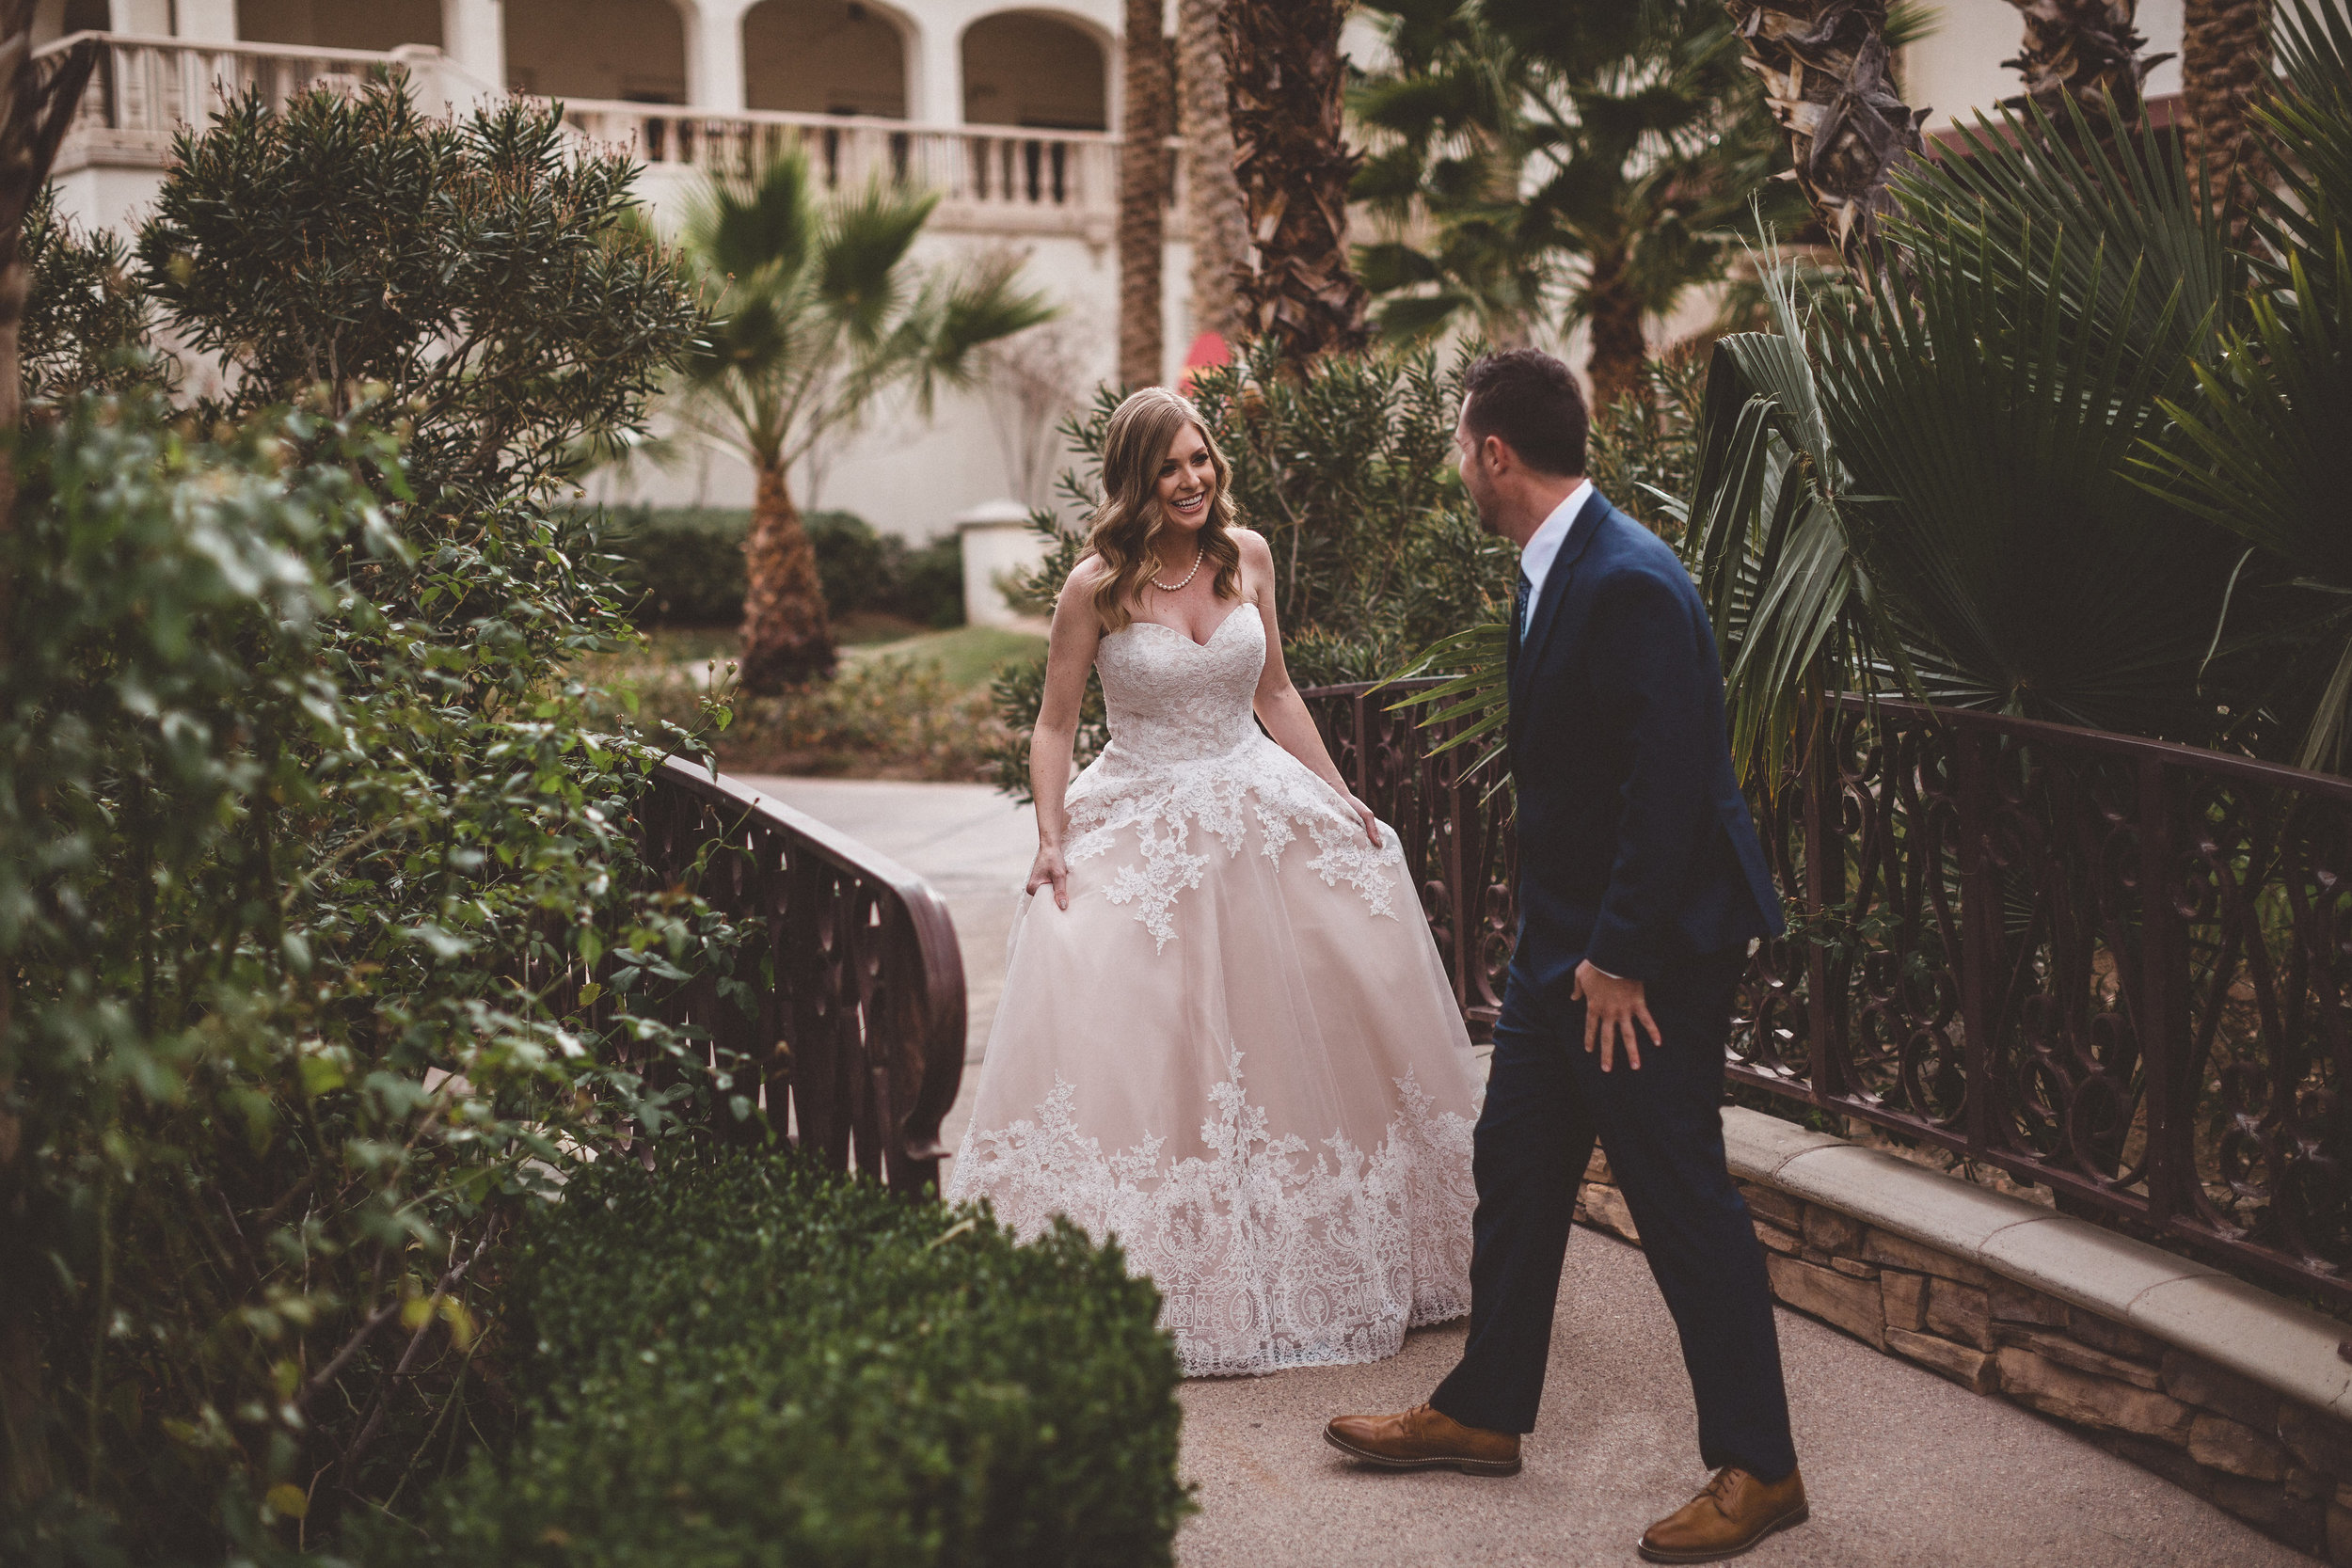 lindsey-and-ryan-intimate-winter-wedding13.jpg